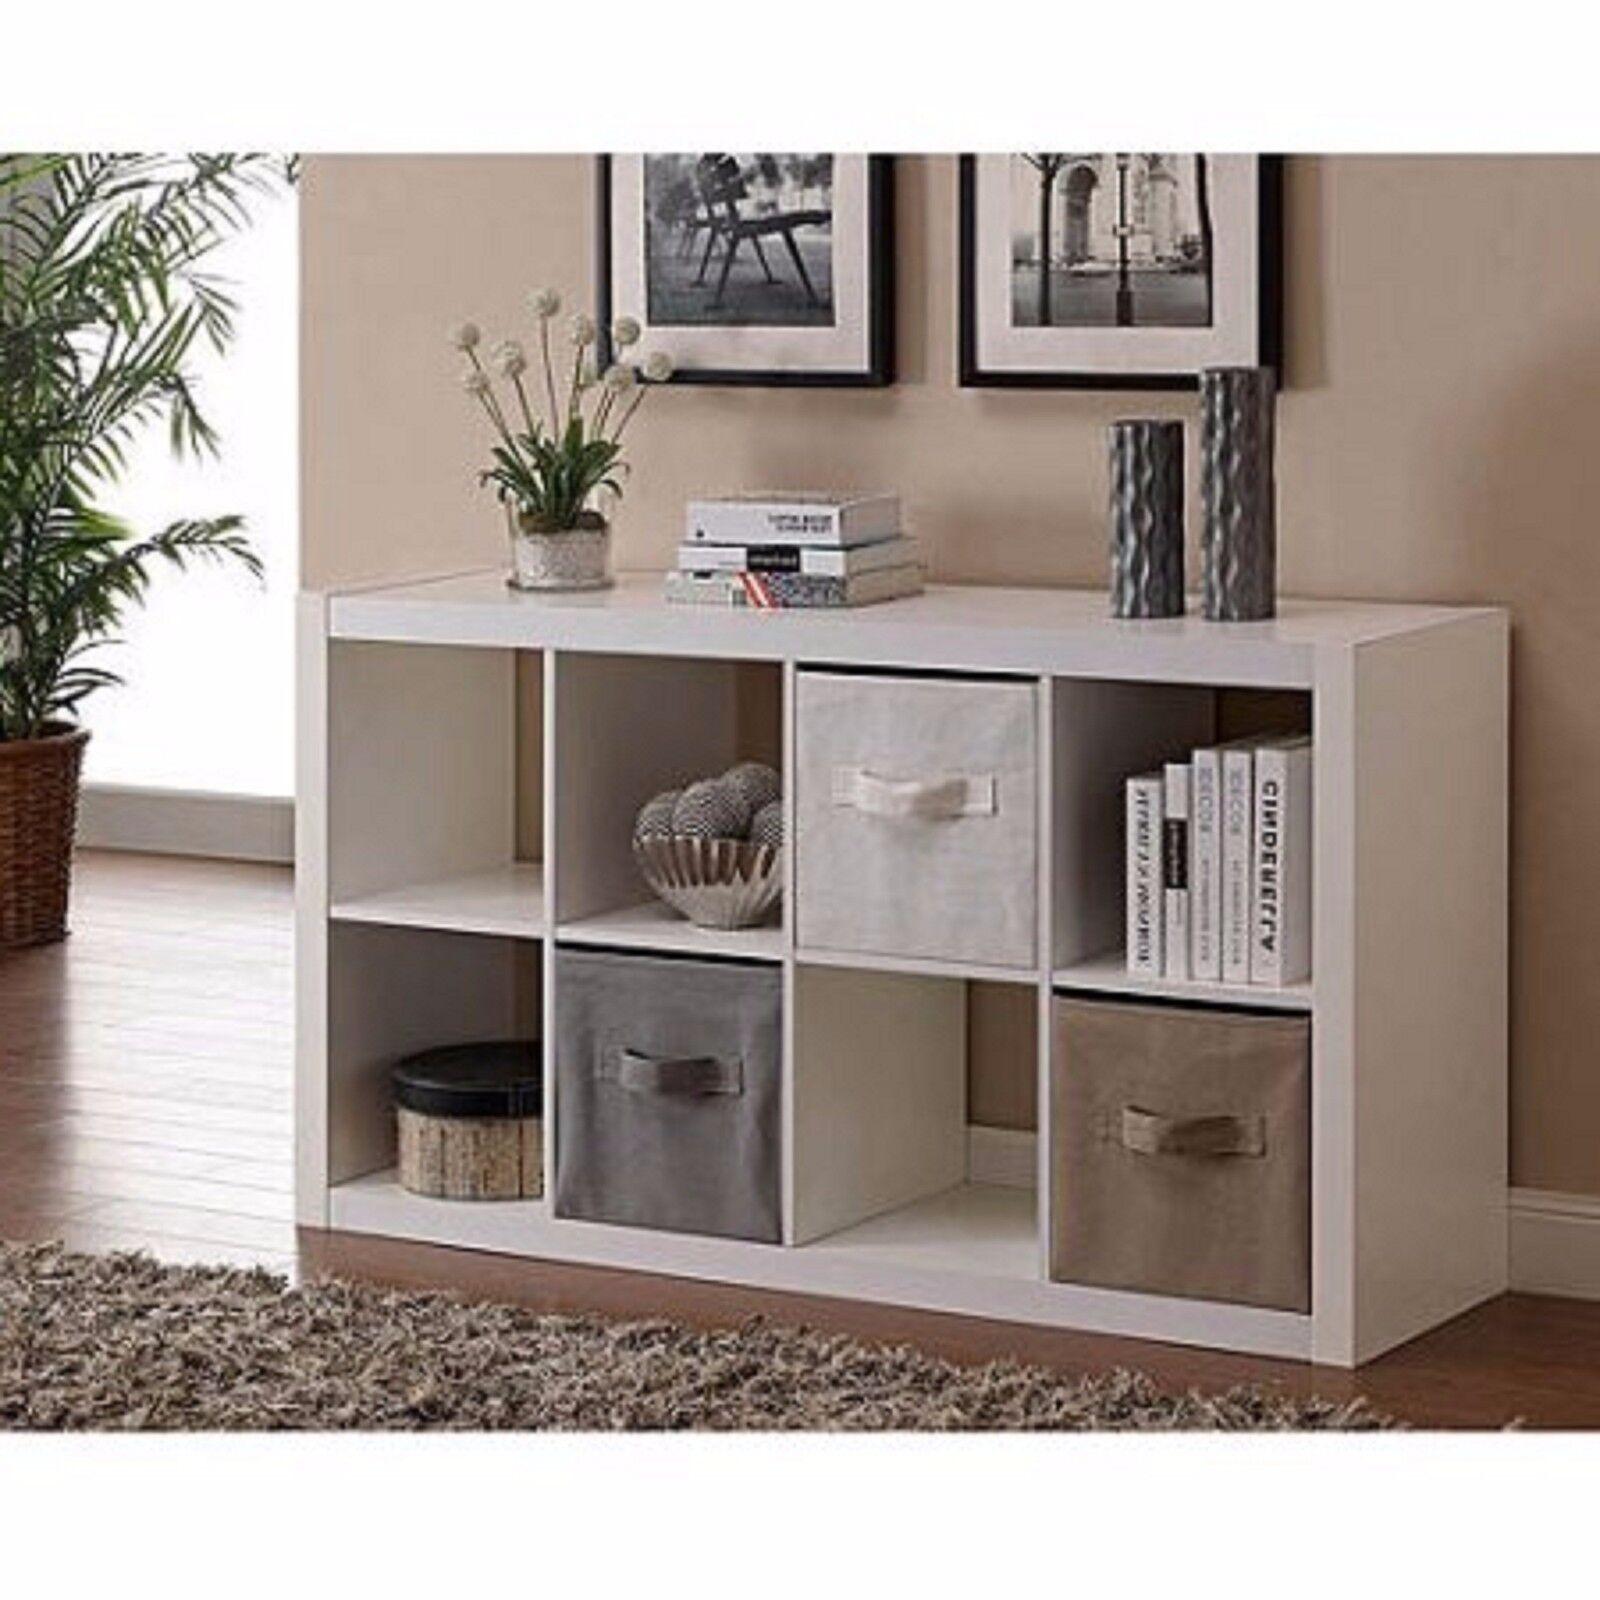 8 Cube Organizer Unit Shelves Storage Modern Bookcase Tv Stand Furniture New